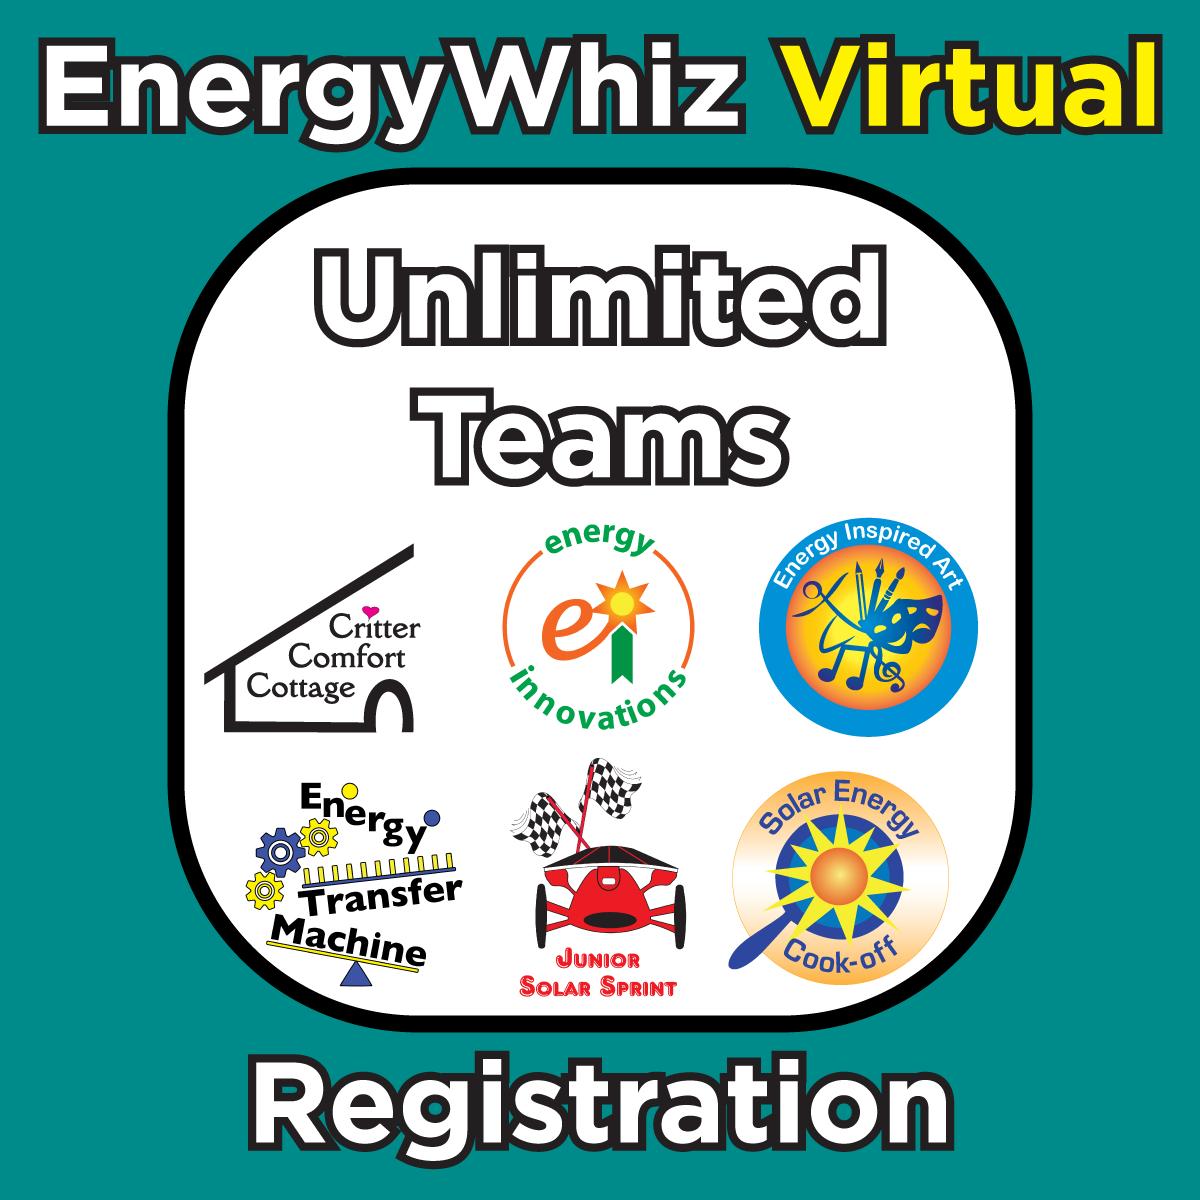 energywhiz virtual unlimited teams registration